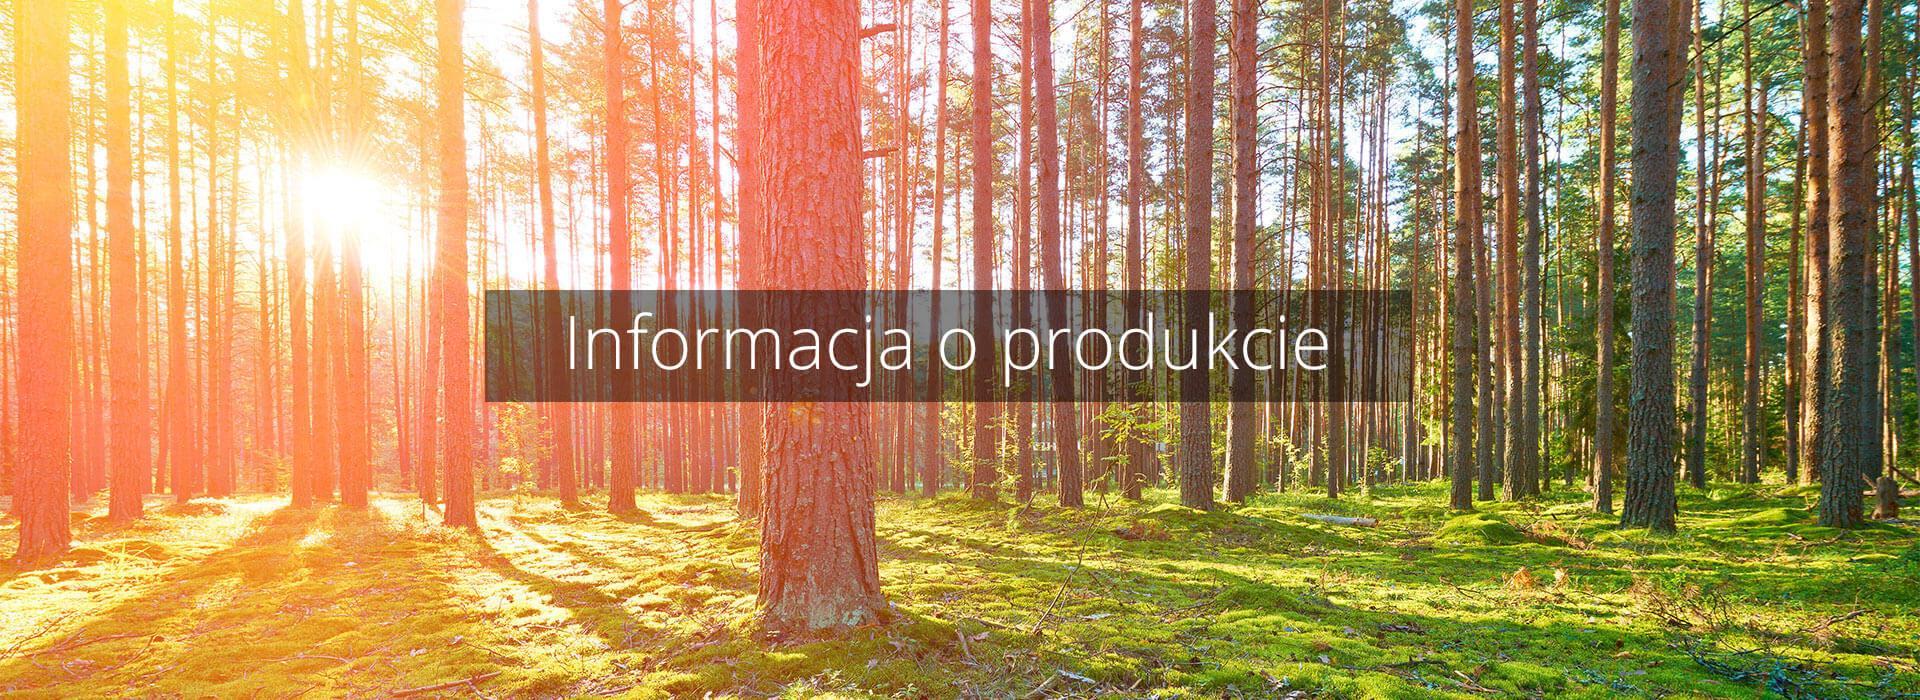 BURNBLOCK informacja o produkcie